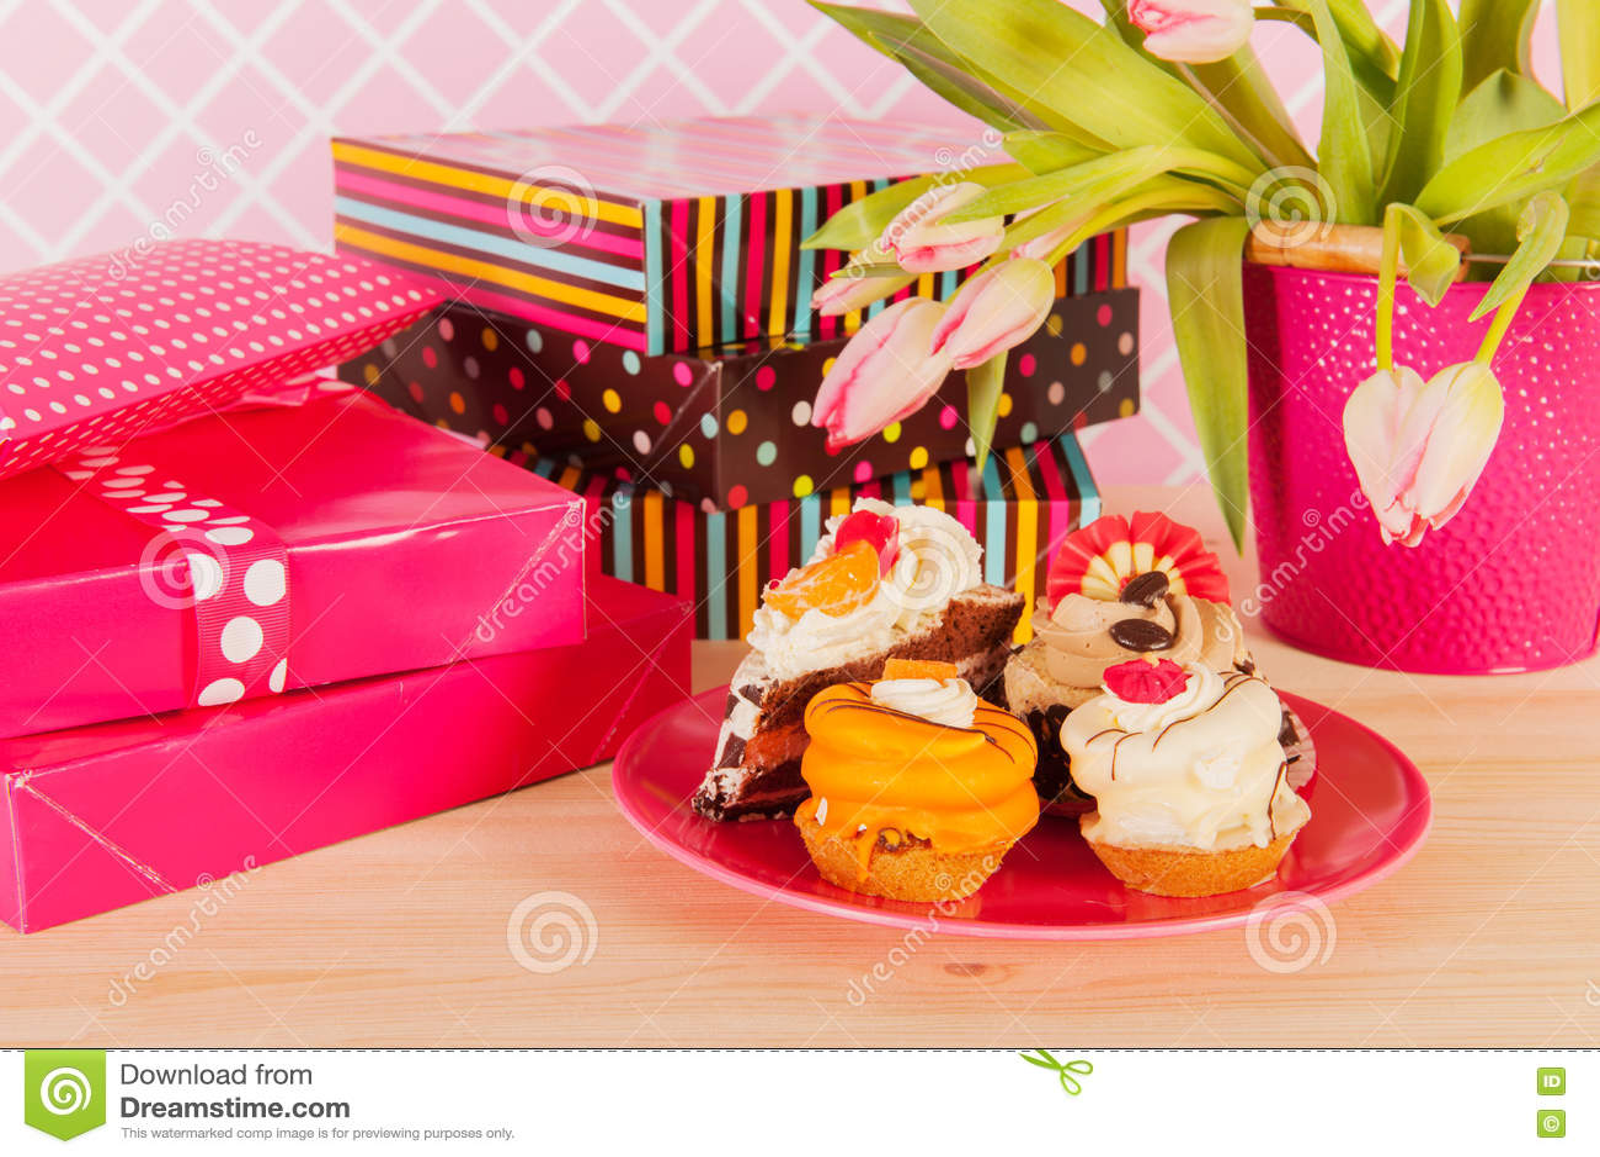 Birthday presents and fancy cakes stock image image of home presents and birthday cakes with flowers izmirmasajfo